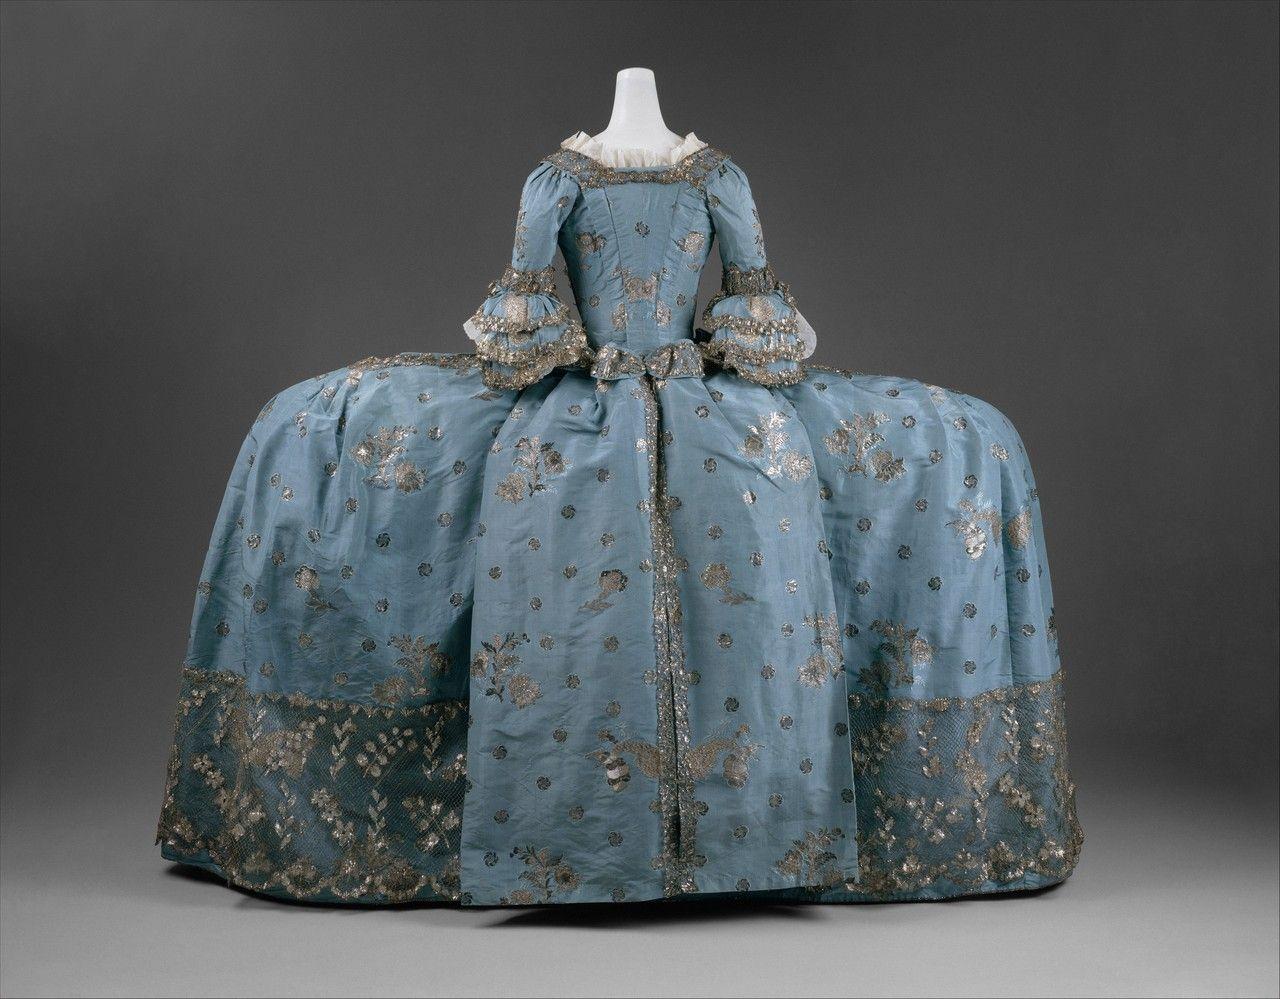 18 century fashion history 16